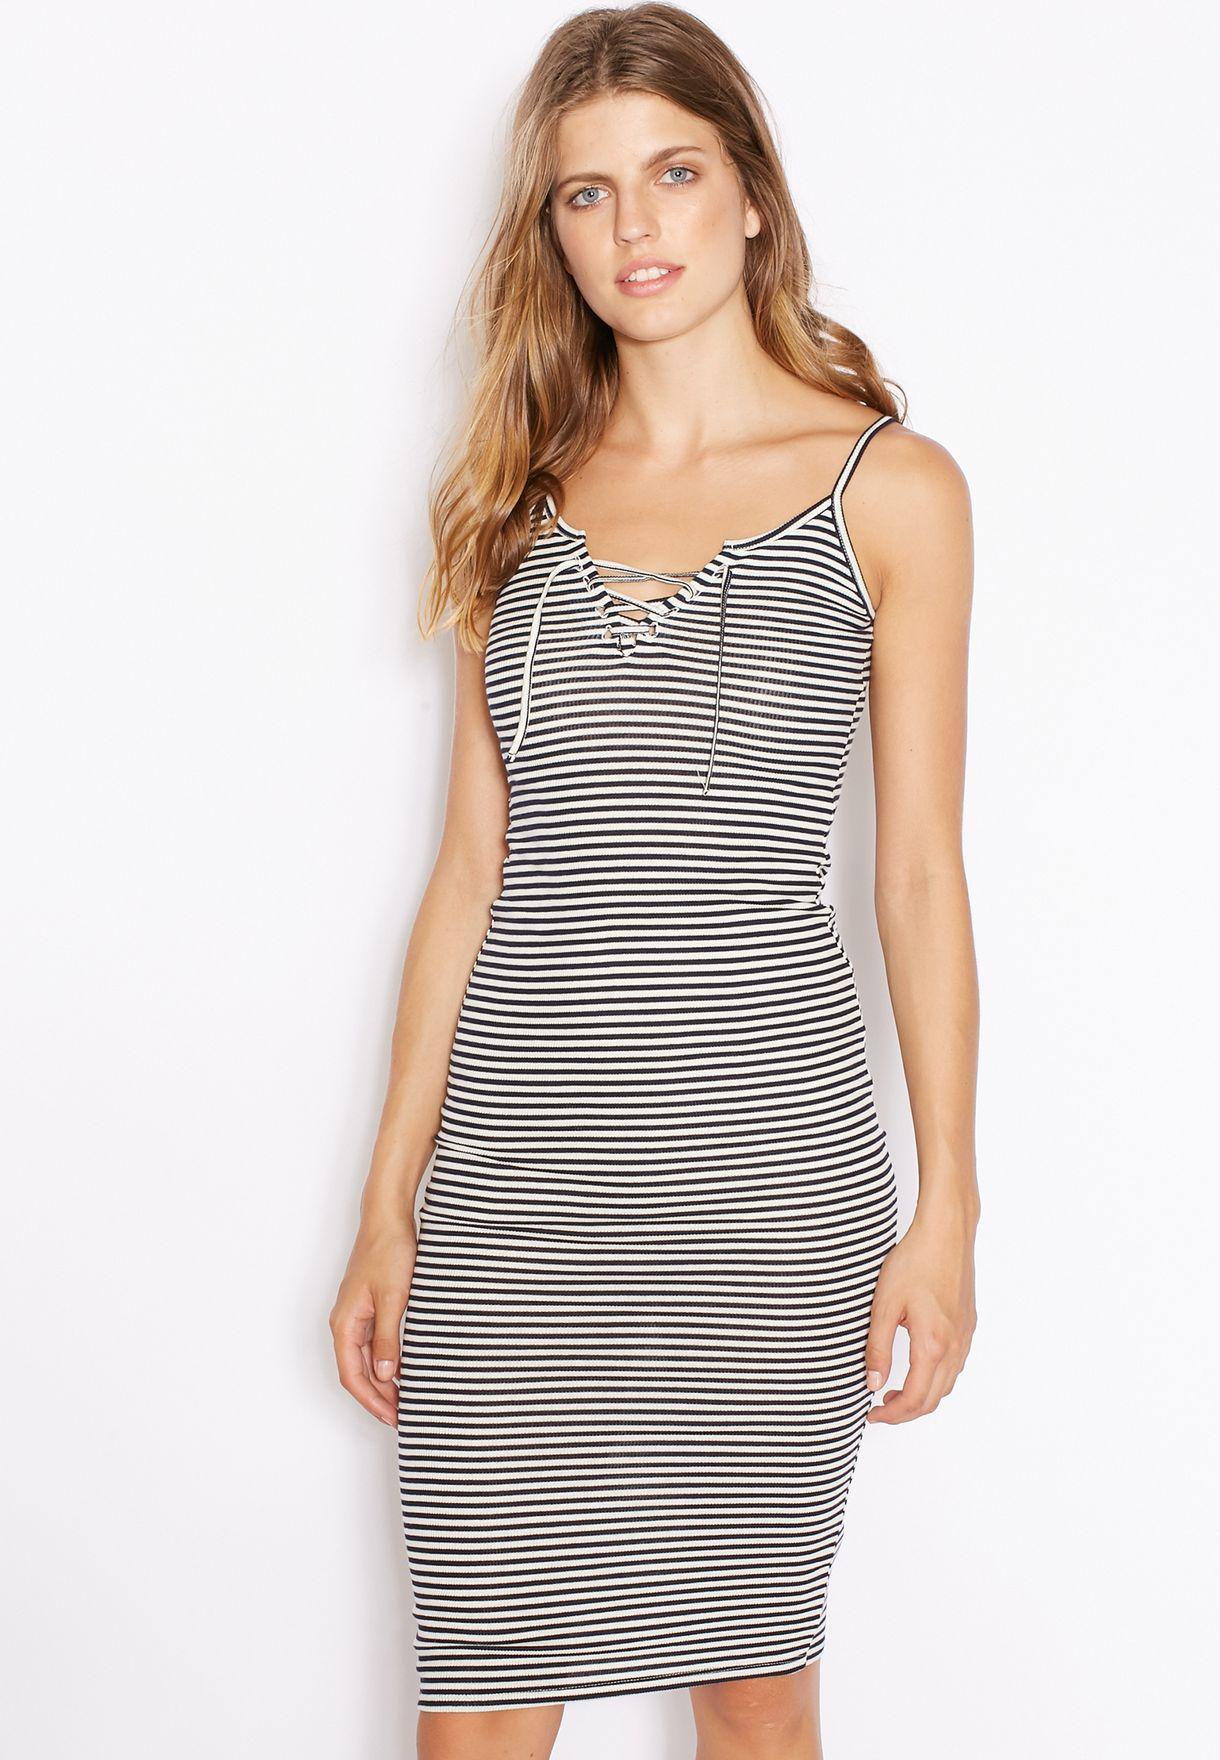 ad38edf99c1 Shop Topshop prints Striped Lace Up Midi Dress 10D06KNAV for Women ...